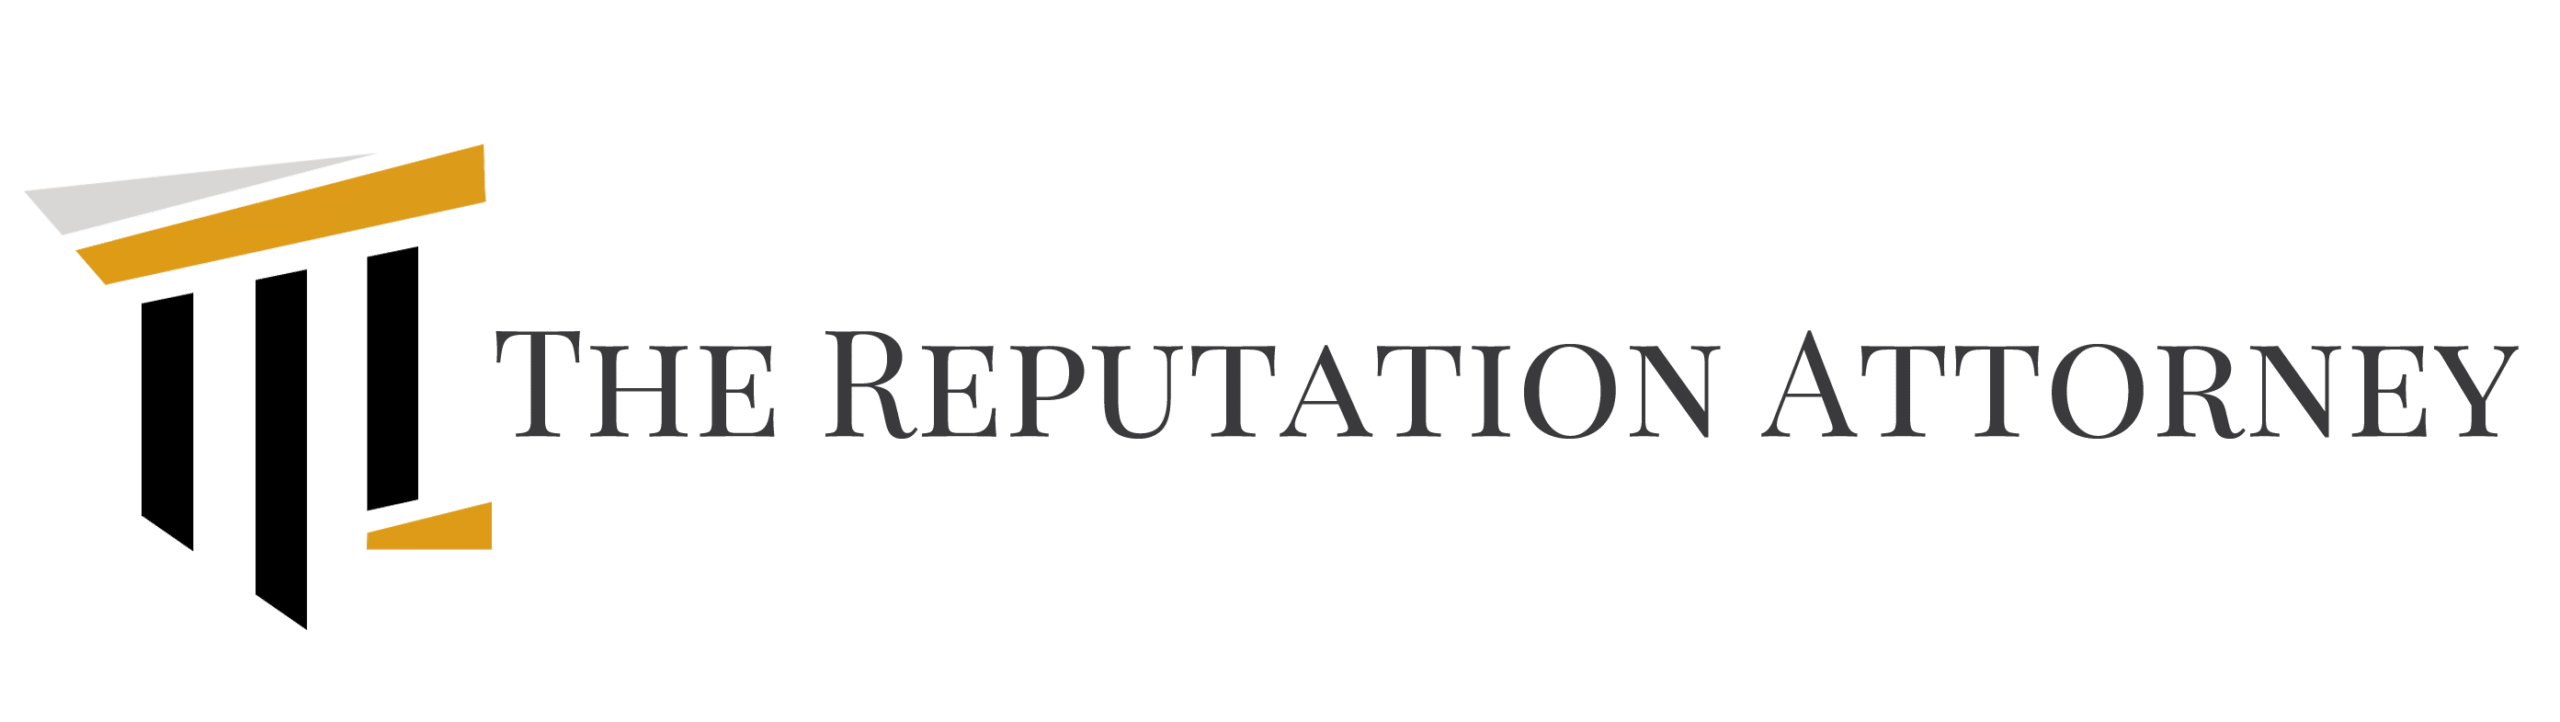 the reputation attorney